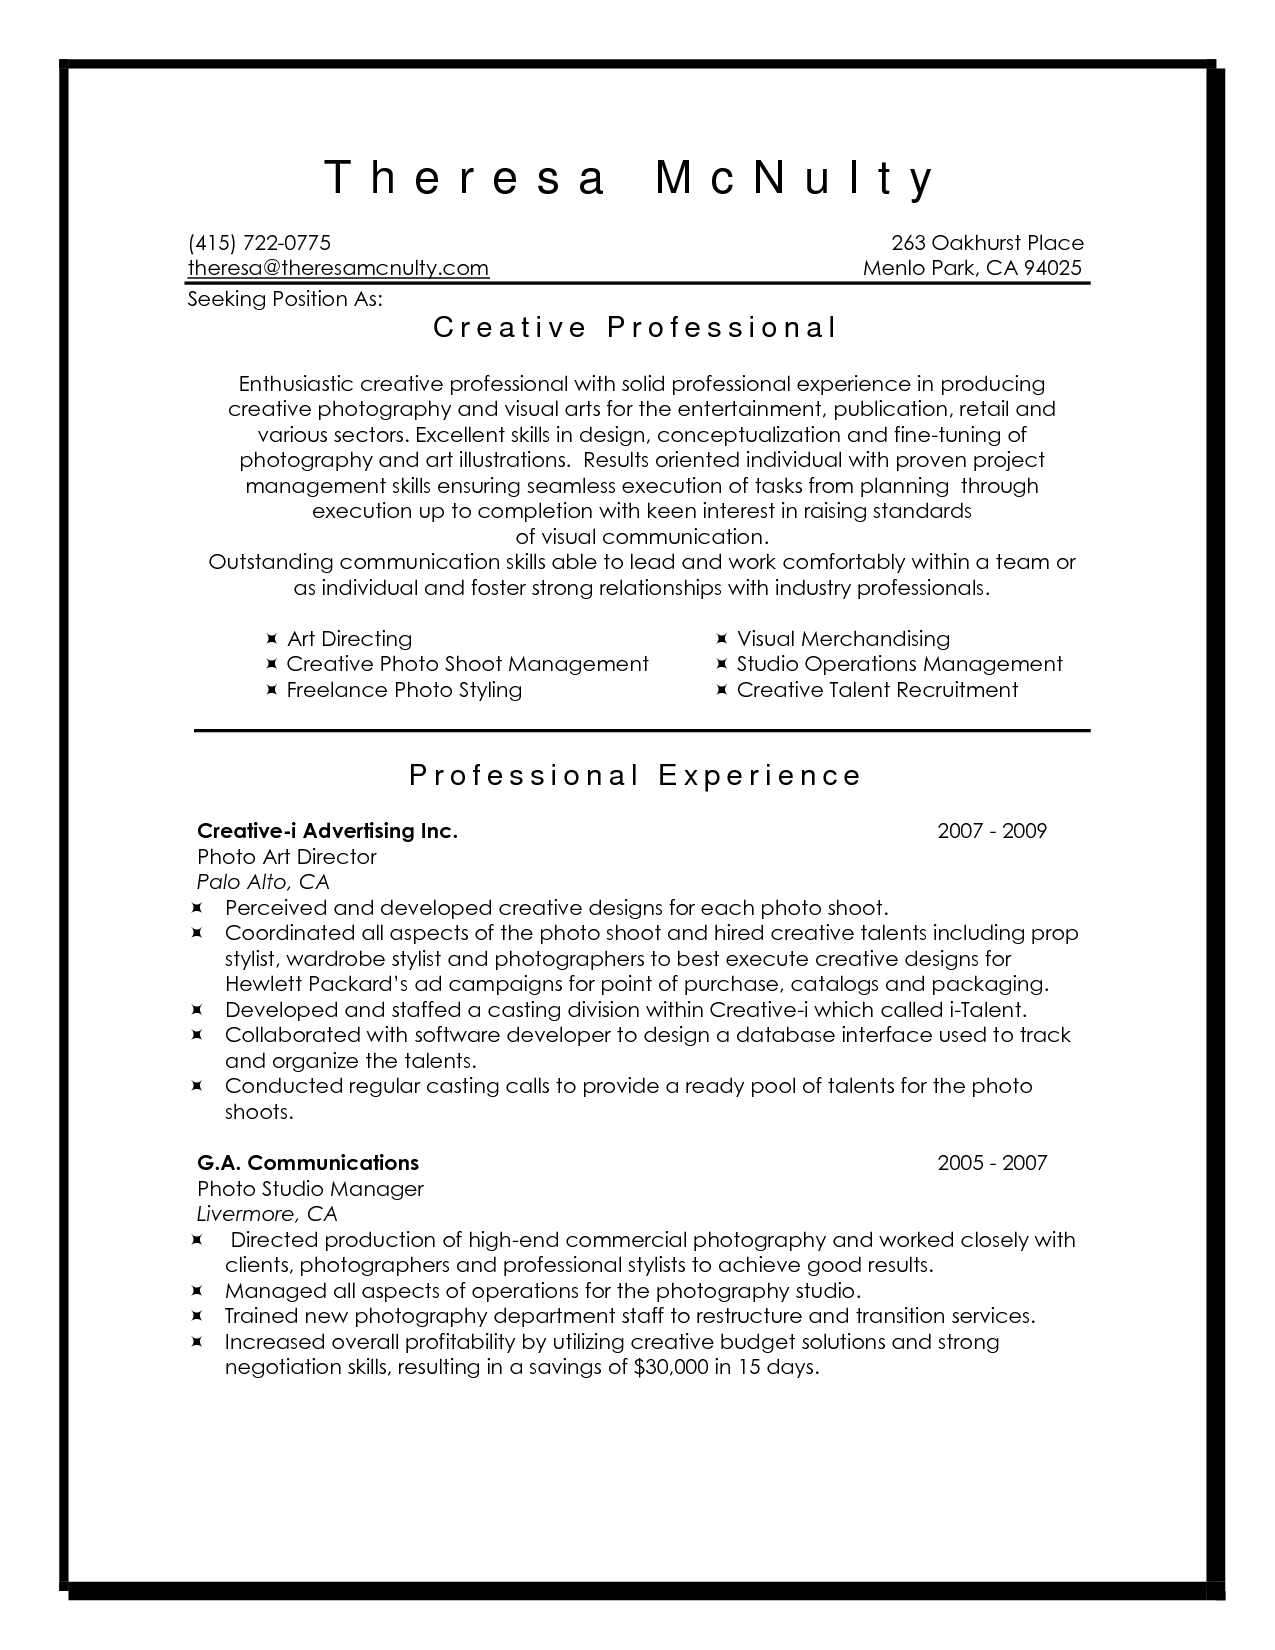 Interior decorating resume sample - researchon.web.fc2.com